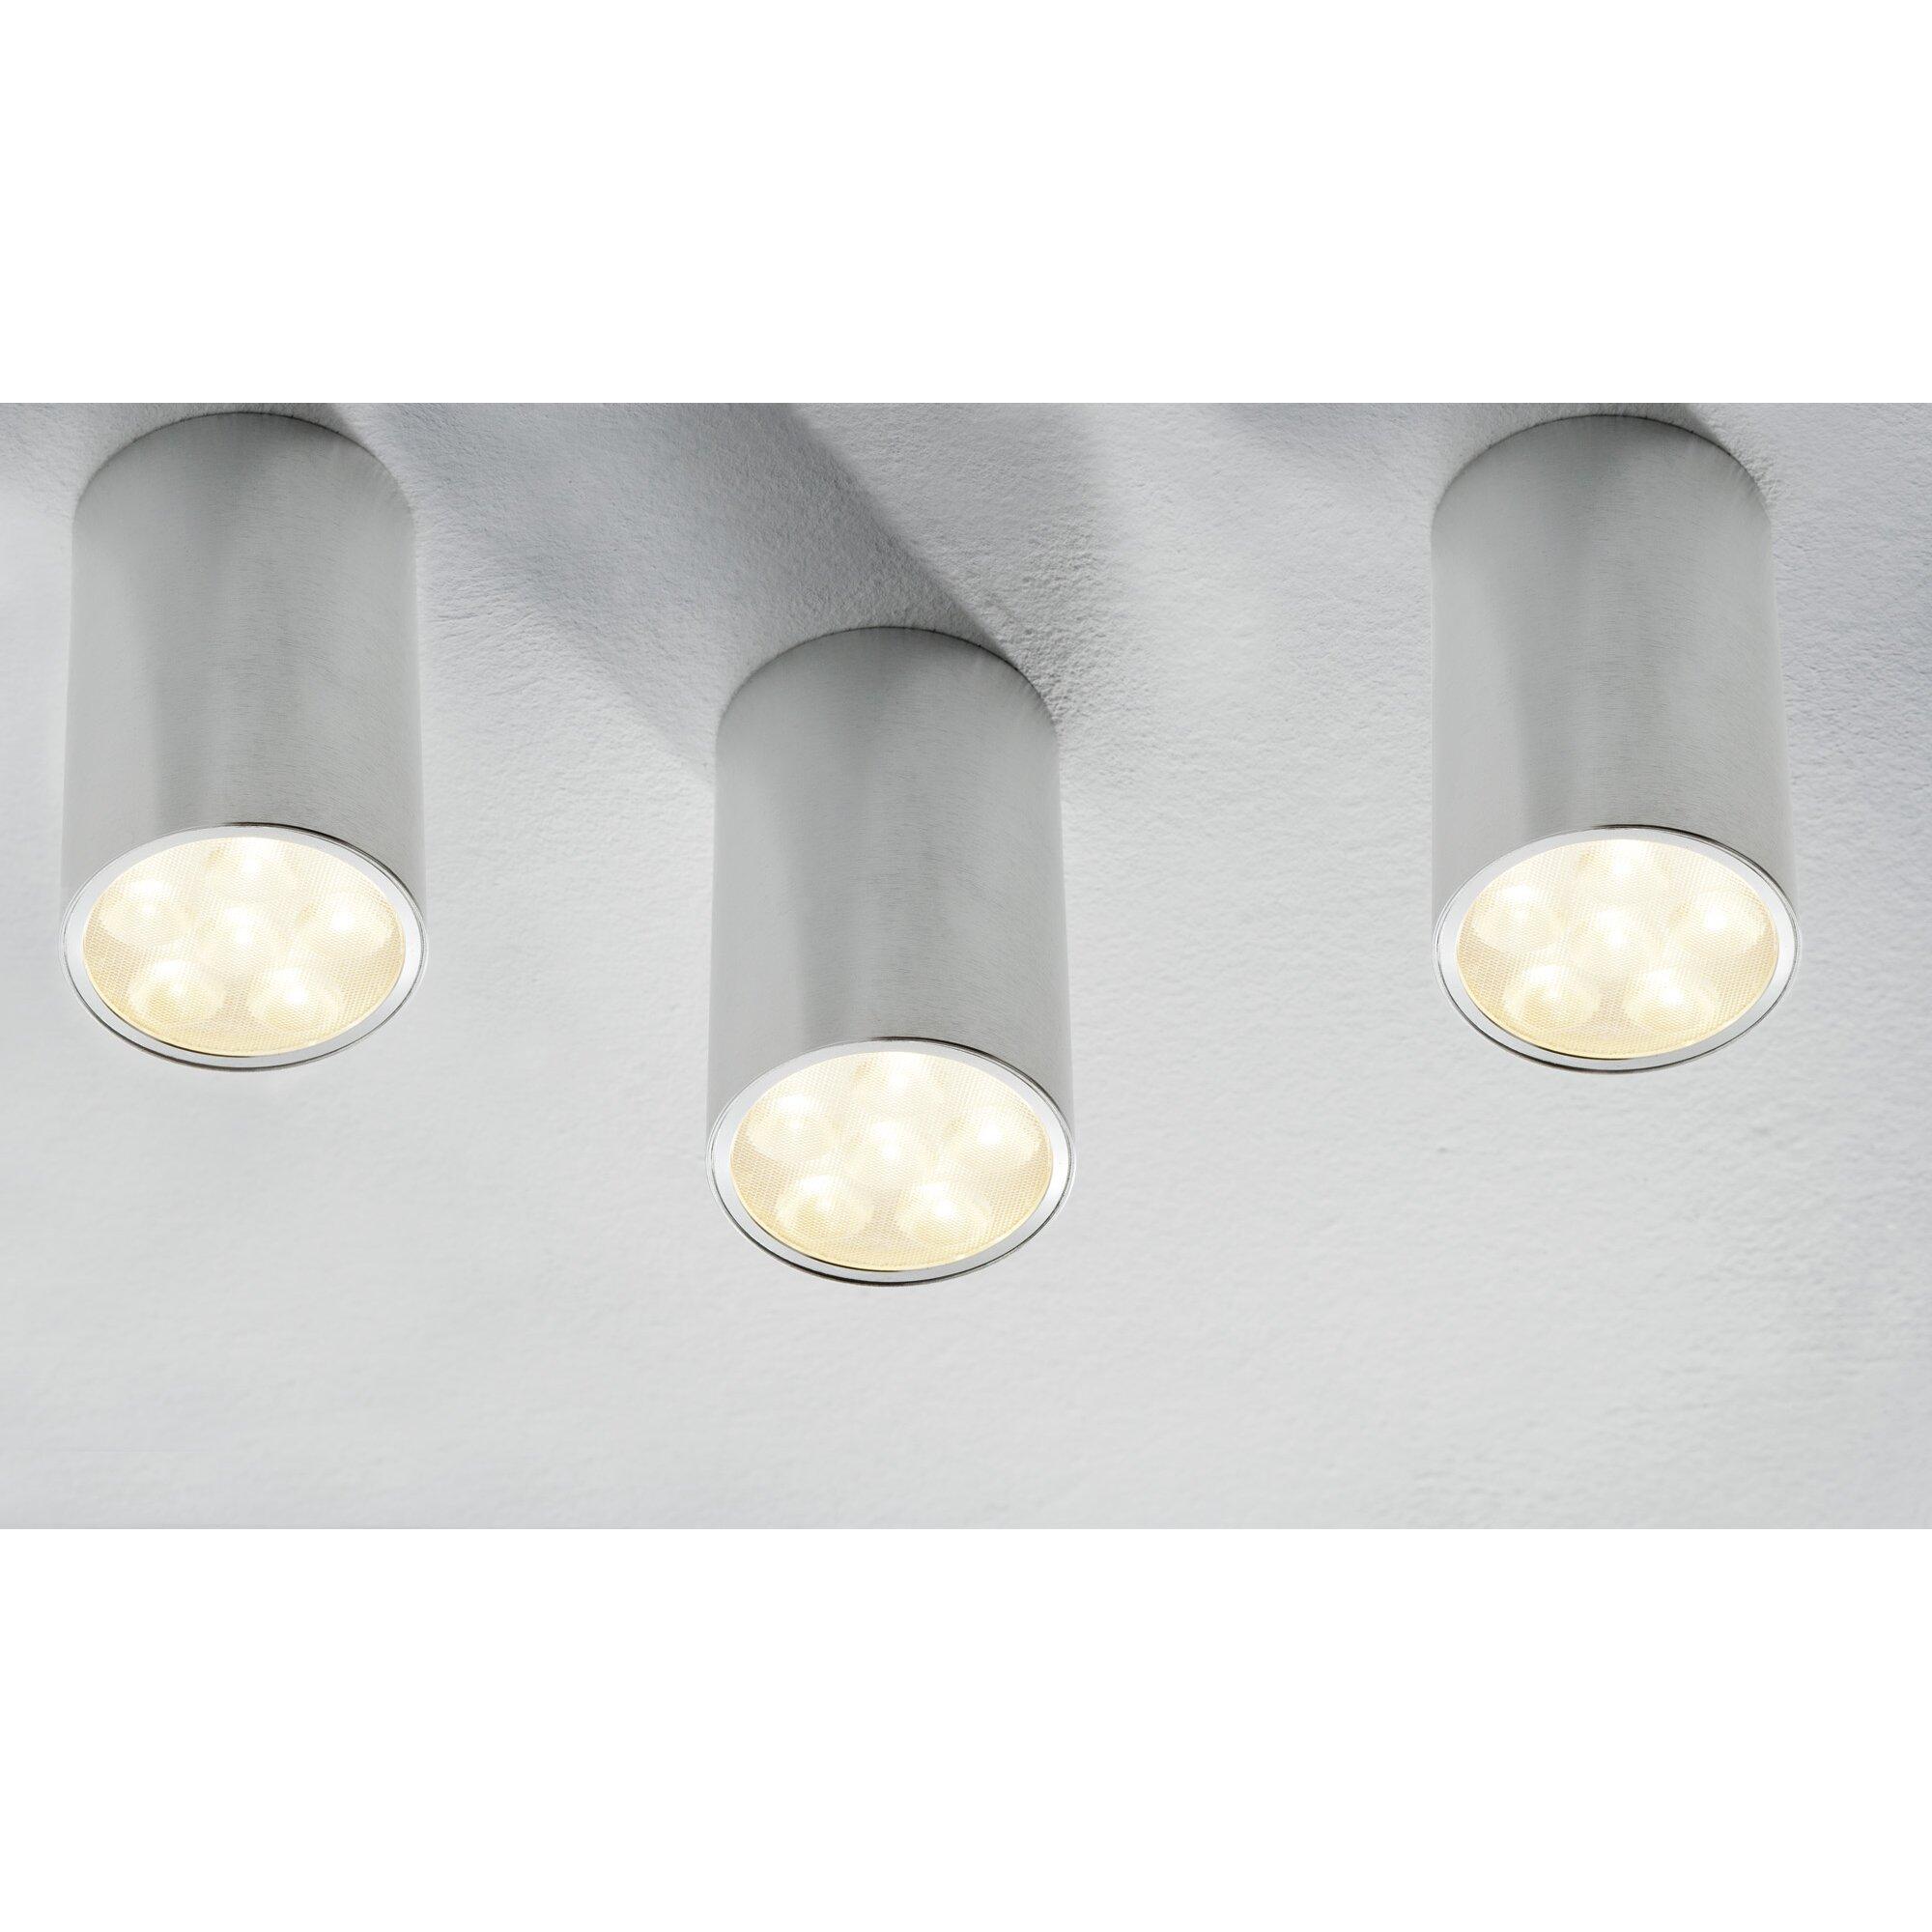 premium line oj 1 light flush ceiling light wayfair uk. Black Bedroom Furniture Sets. Home Design Ideas